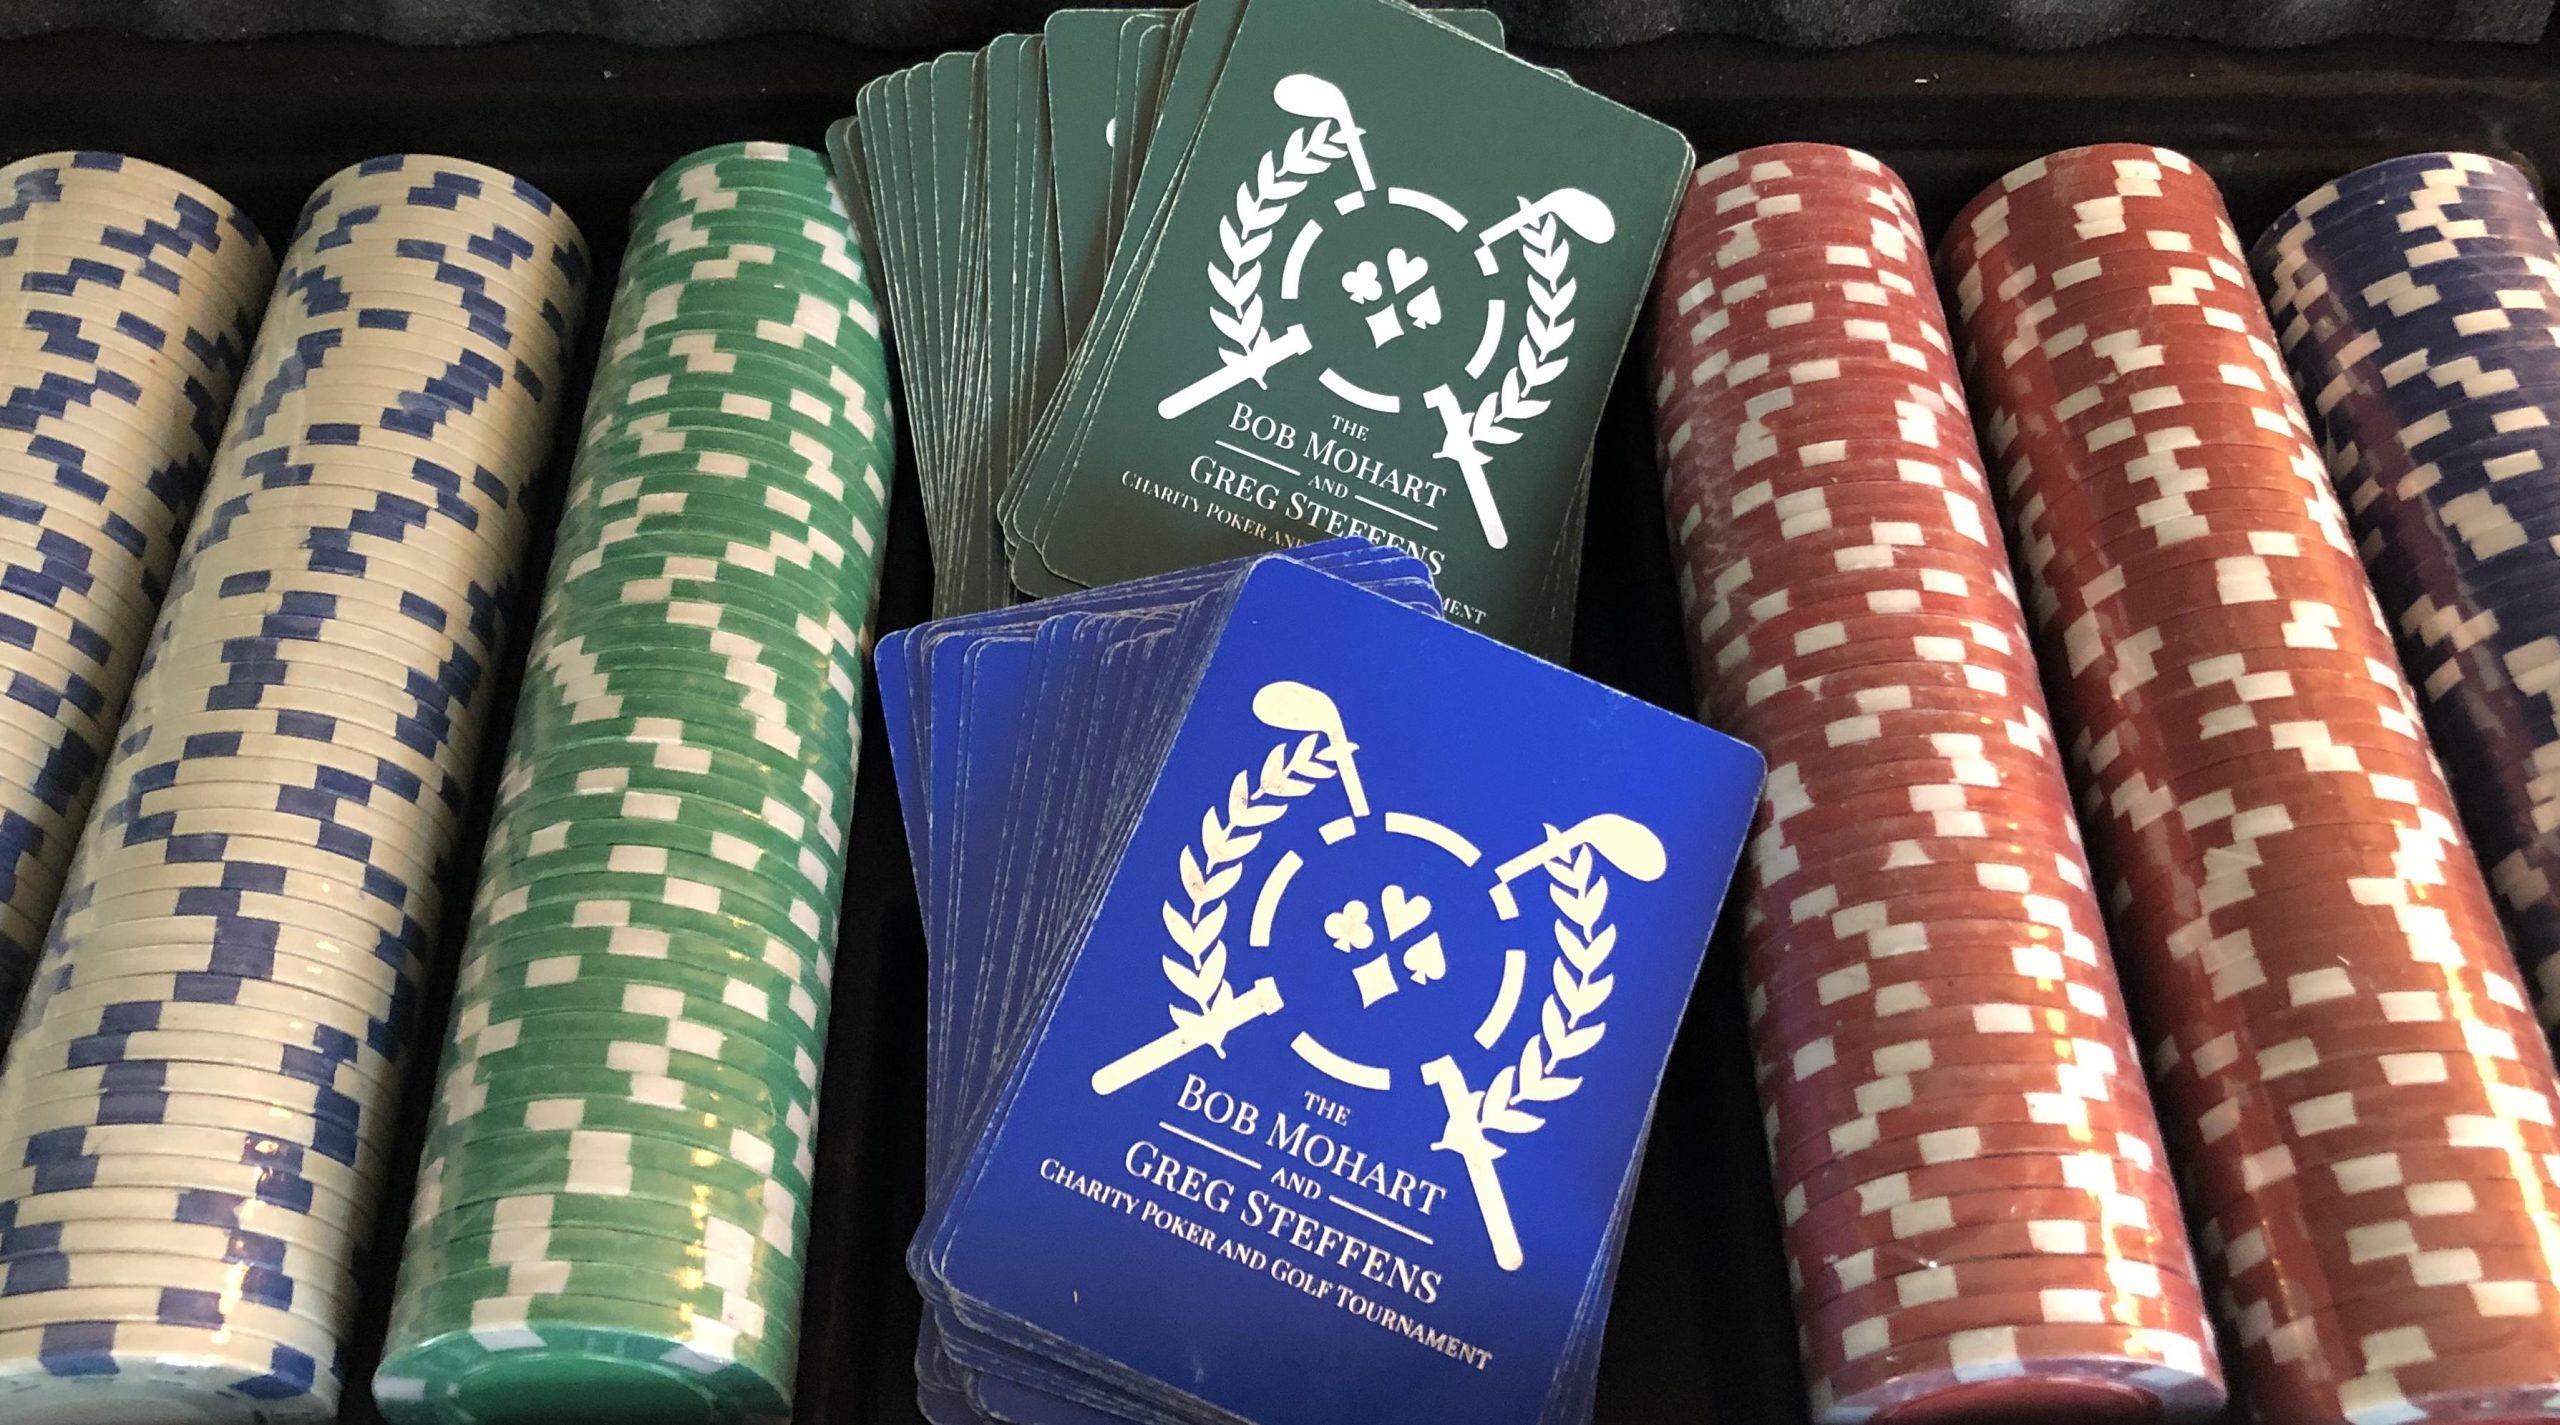 Bob Mohart and Greg Steffens Charity Poker and Golf Tournament